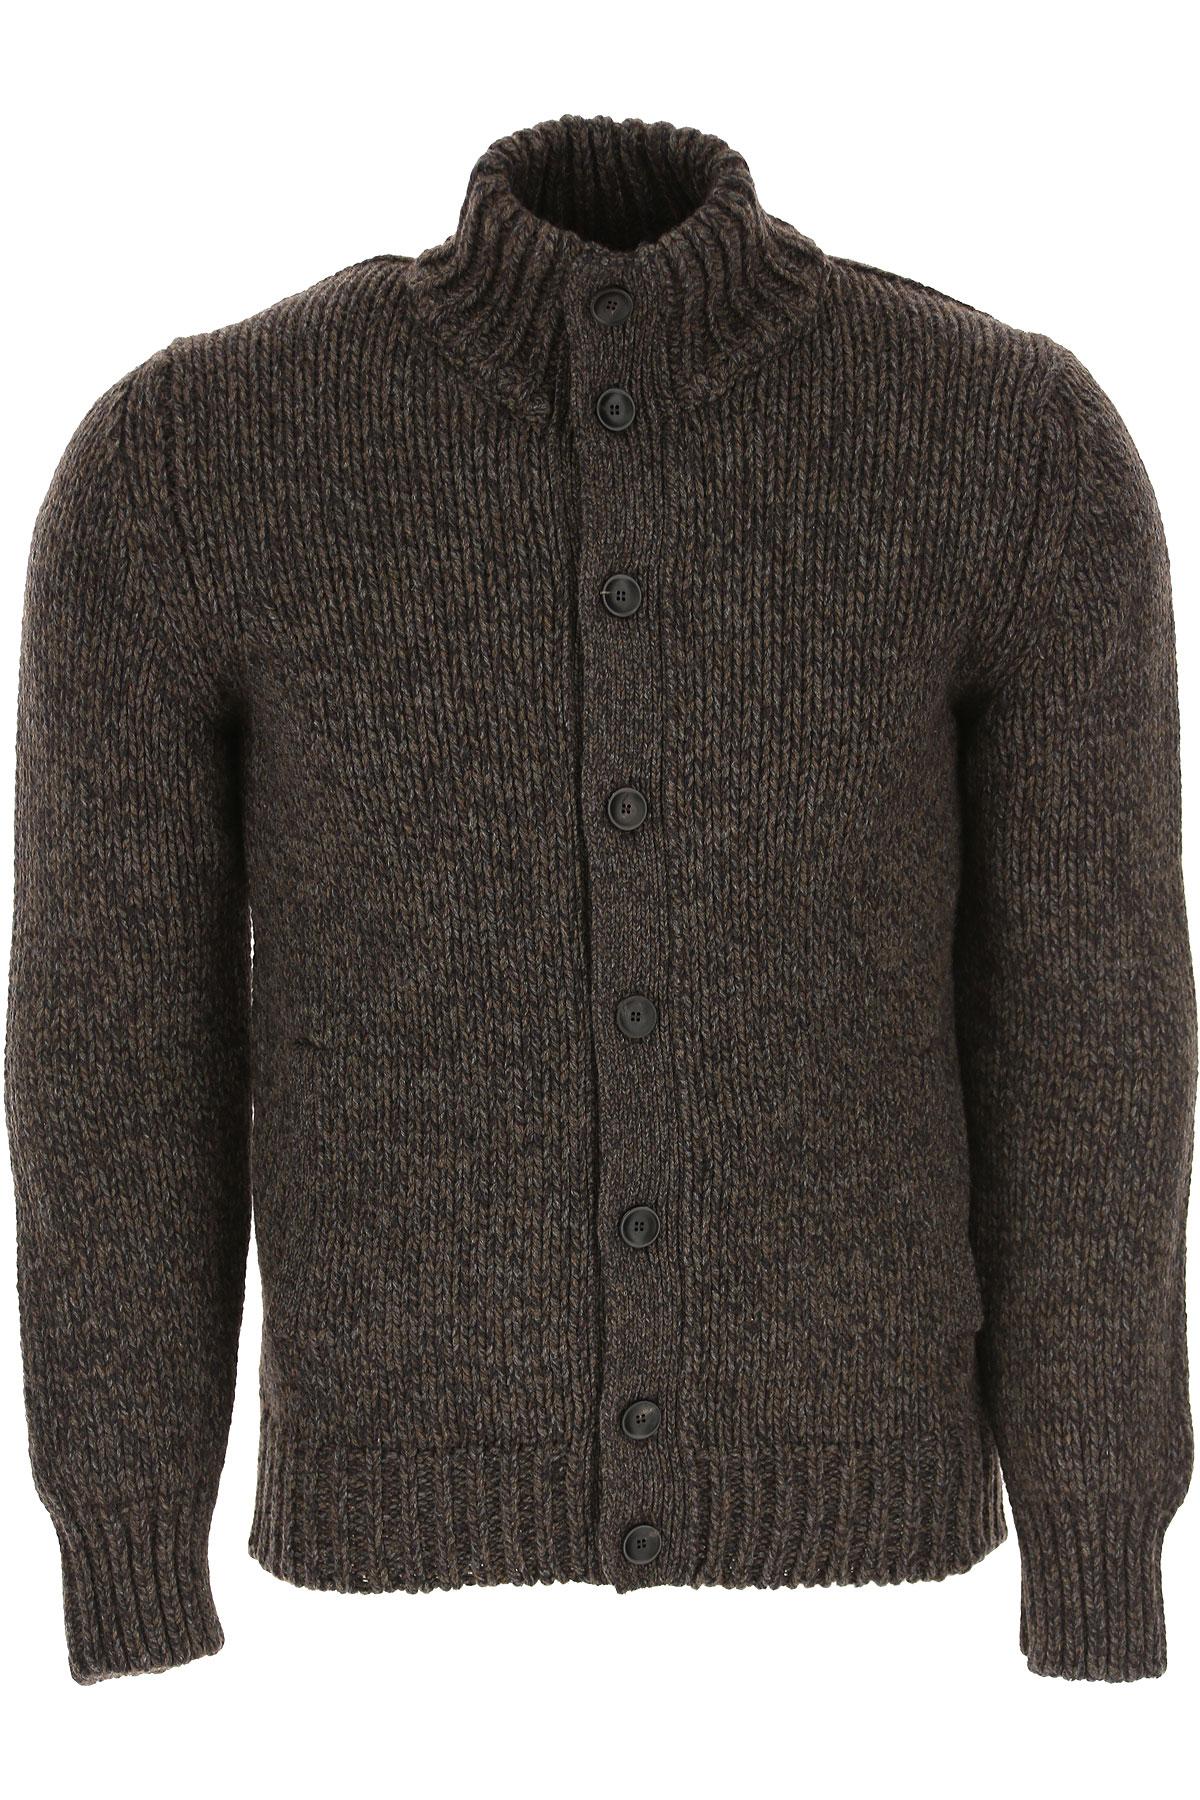 Incotex Sweater for Men Jumper On Sale, Brown, Wool, 2019, L M XL